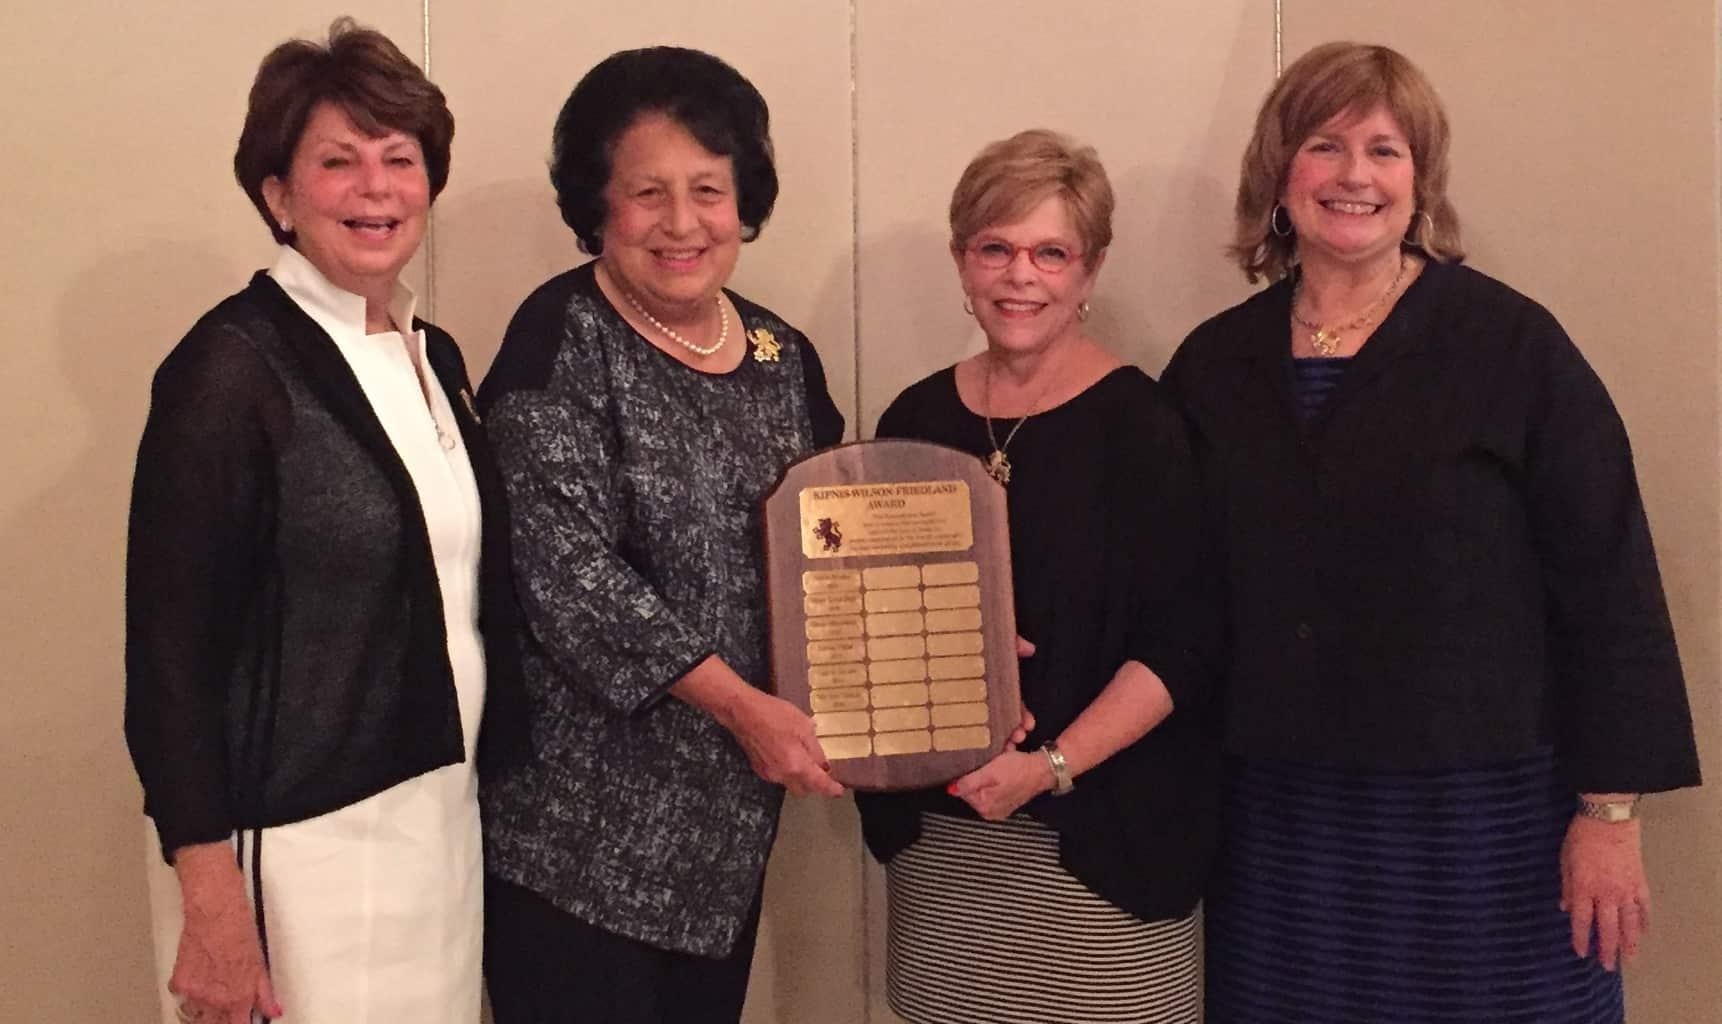 marlene-tenenbaum-gerson-honored-with-2016-kipnis-wilsonfriedland-award